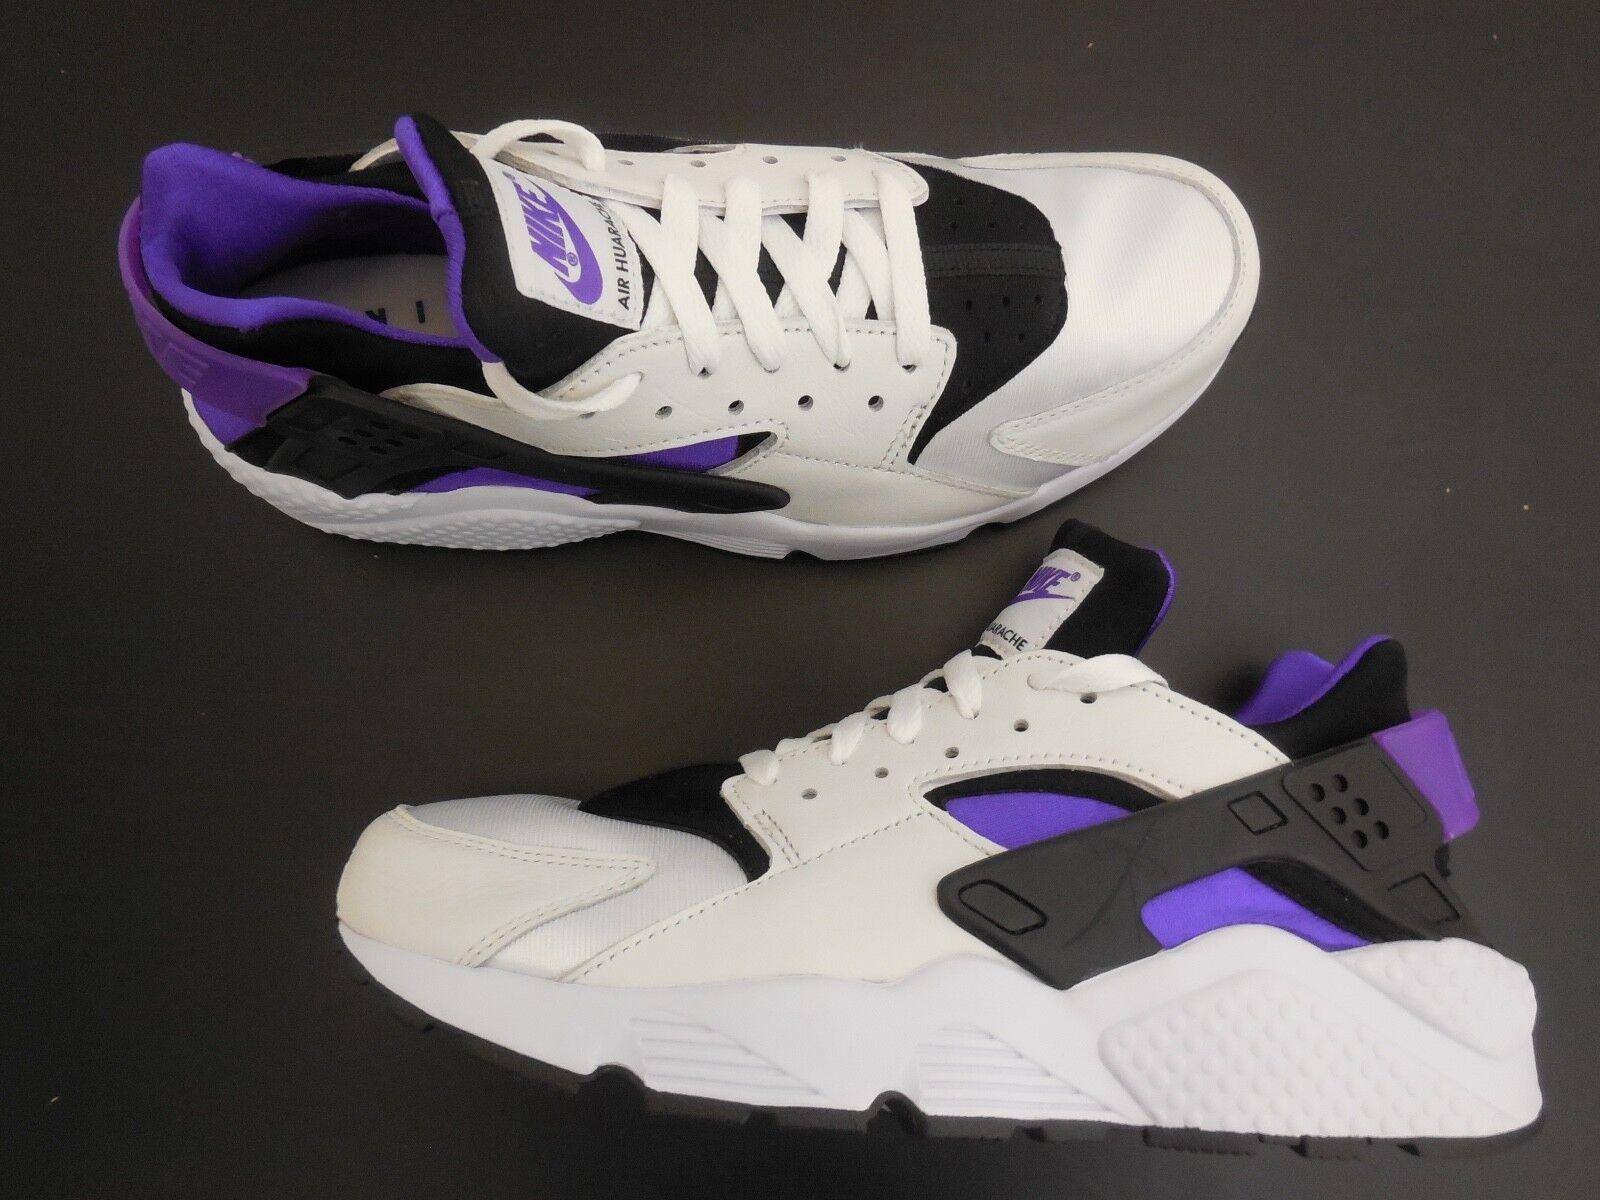 Men's Men's Men's Nike Air Huarache Run '91 QS shoes -Limited- StyleAH8049 001 -Sz 9 -NEW d78705